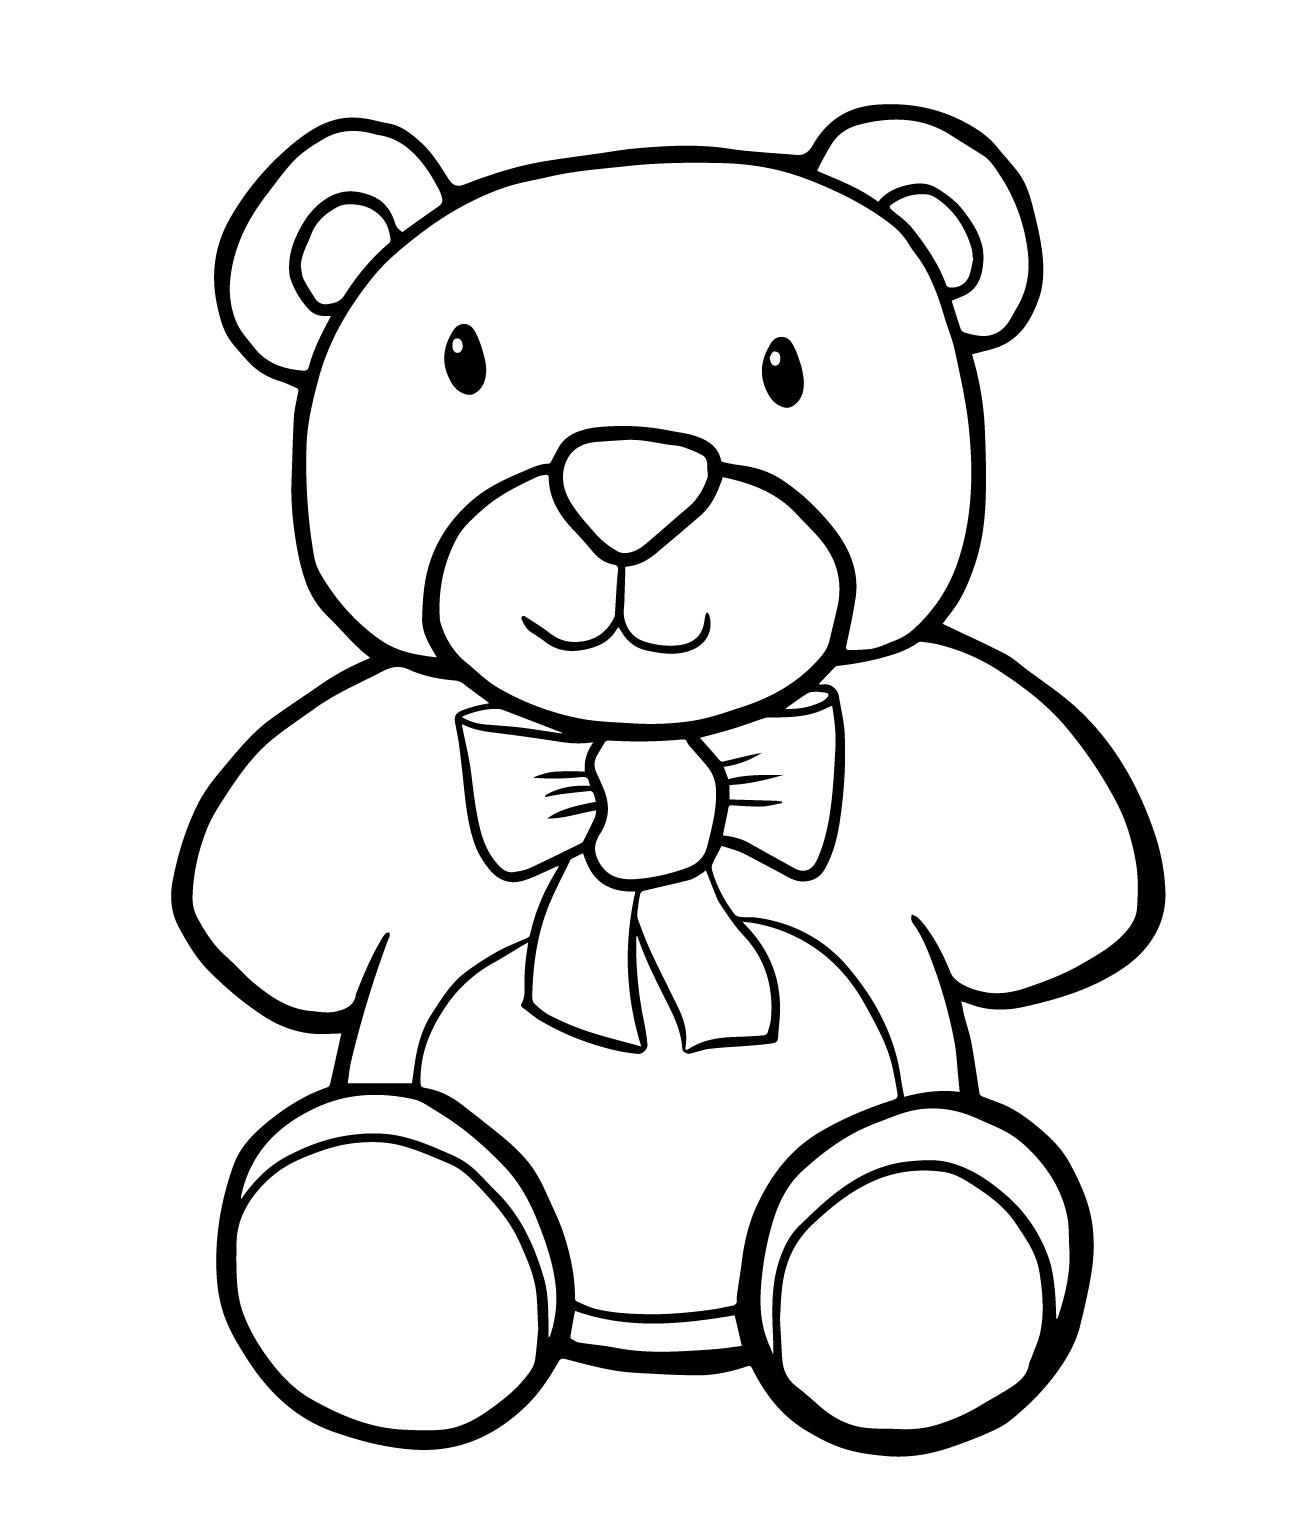 Teddy bear coloring sheets